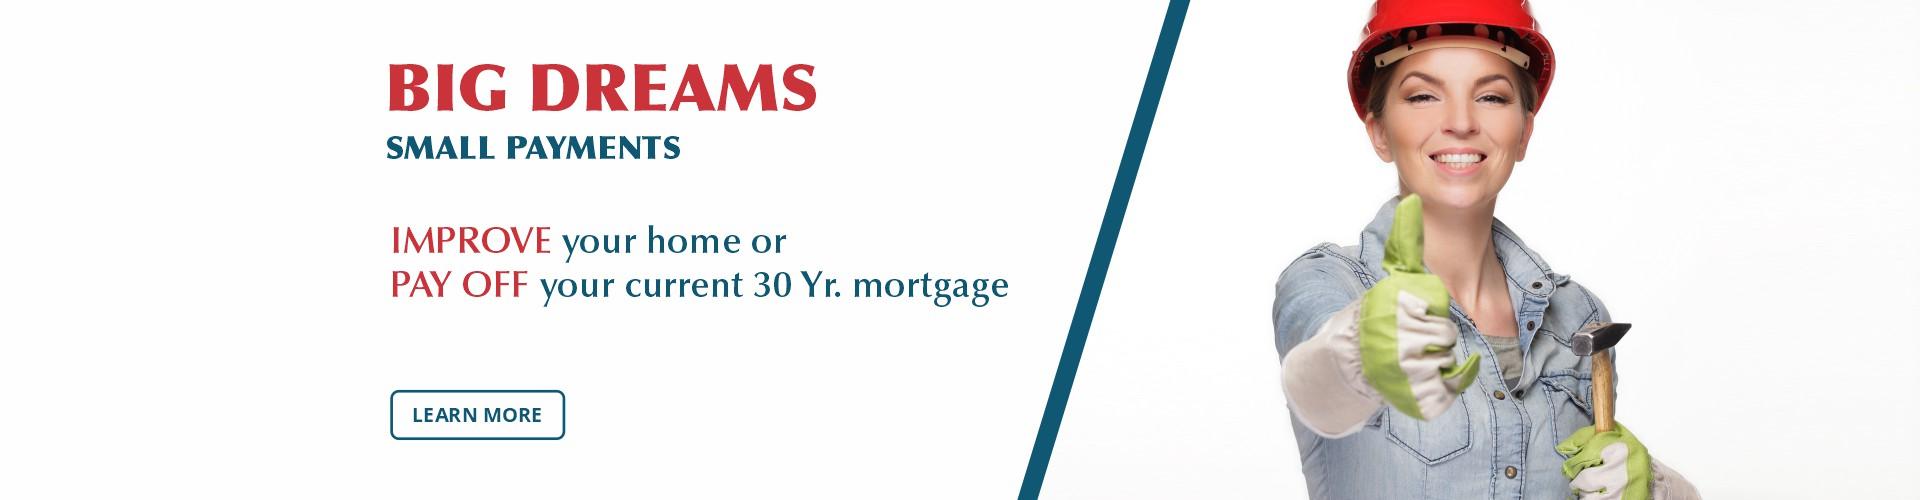 Malden FCU Home Equity Loan